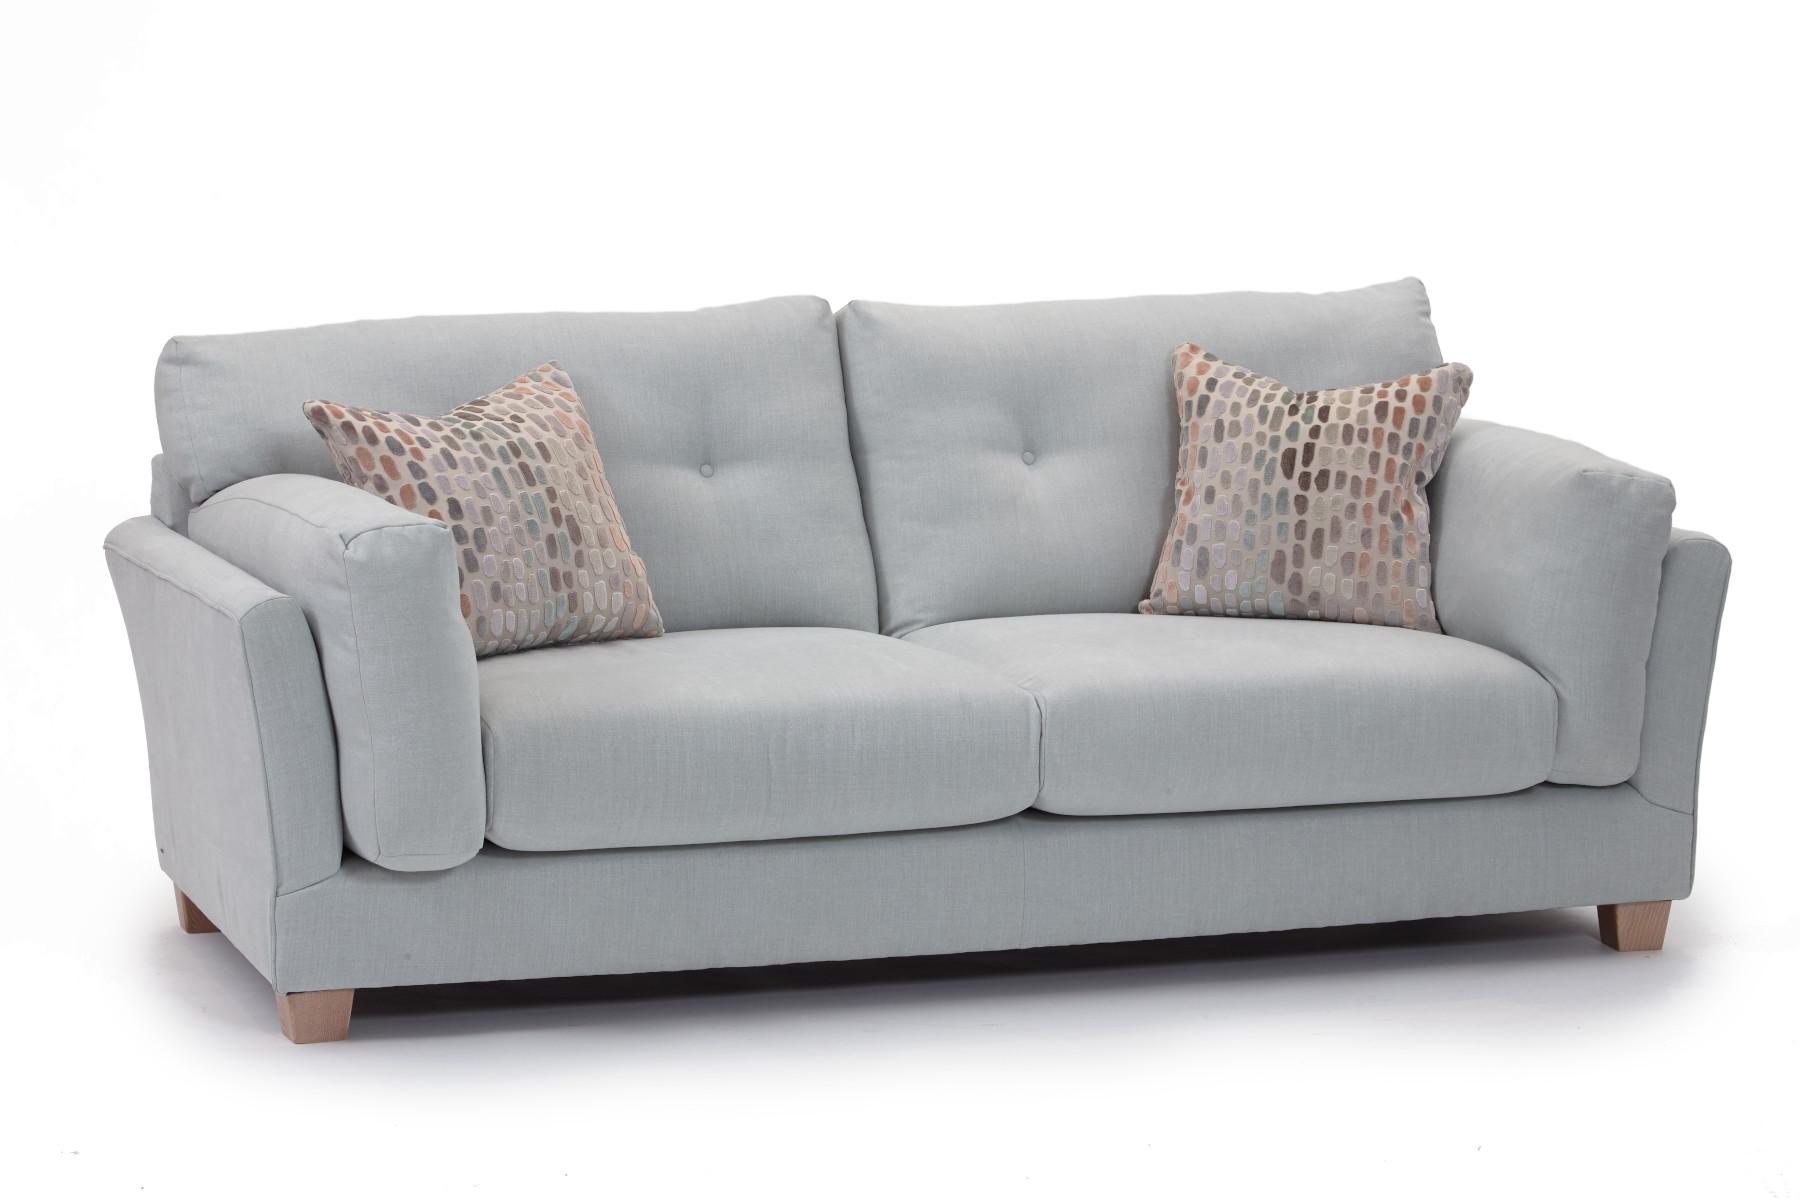 Camille Large Sofa